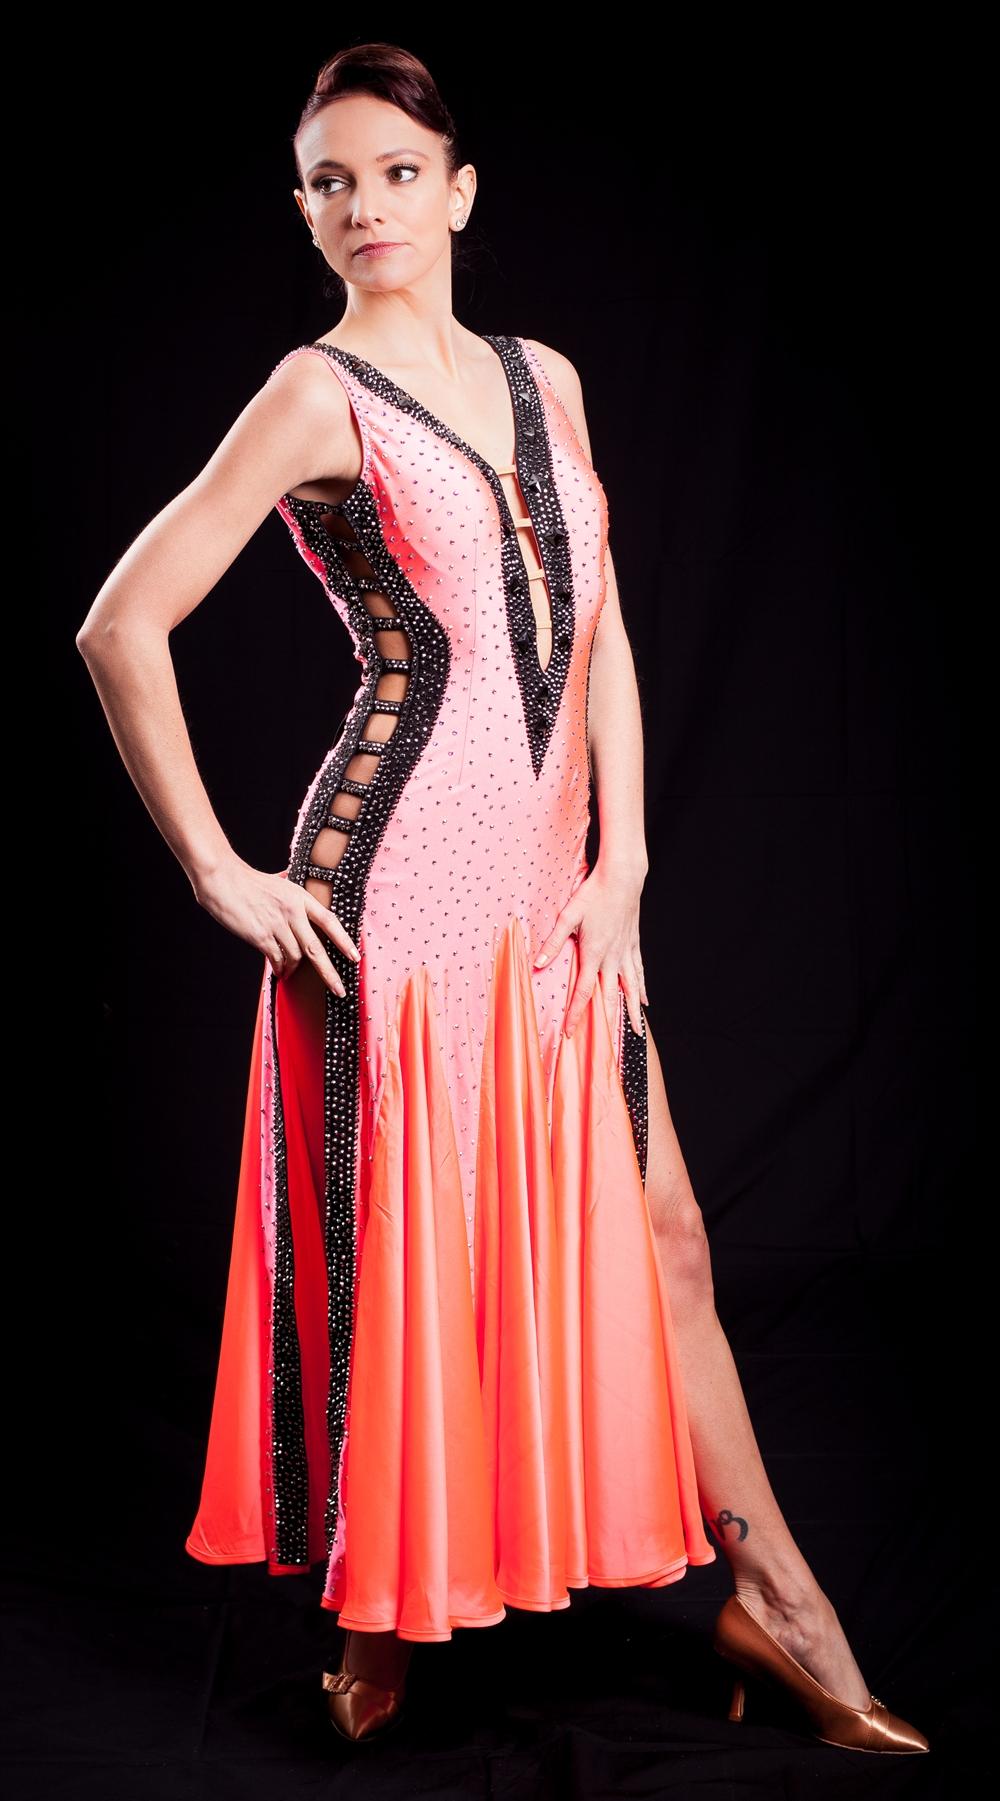 Elegant Amp Sexy Coral Ballroom Dress